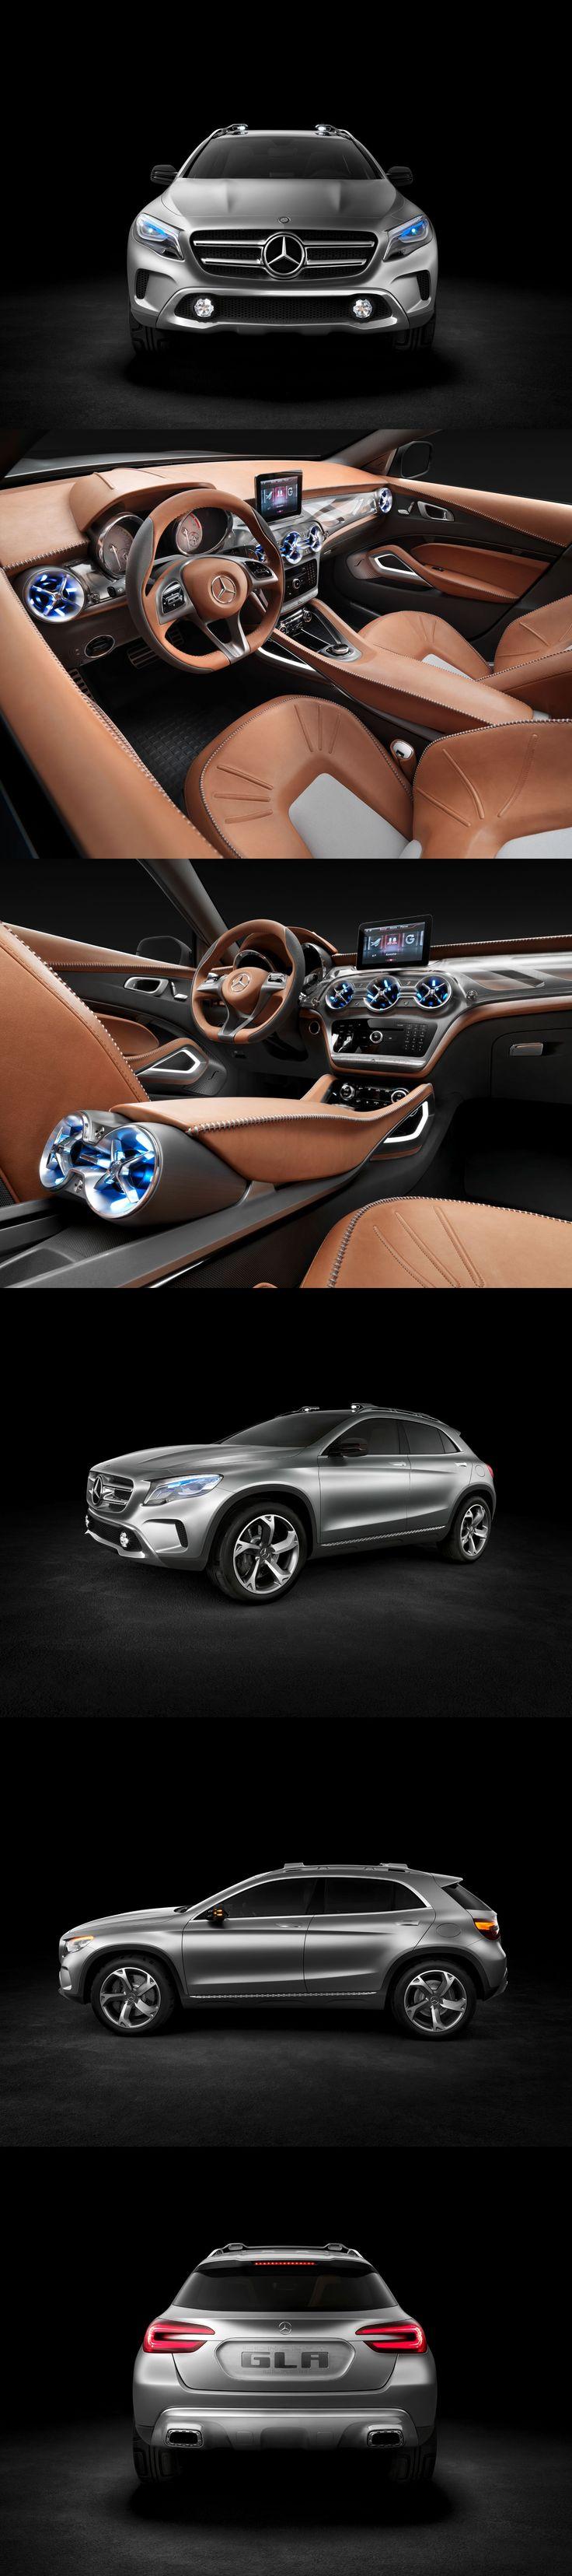 http://auto-rev.blogspot.com/2014/04/mercedes-benz-gla45-amg-2015.html  Mercedes-Benz GLA